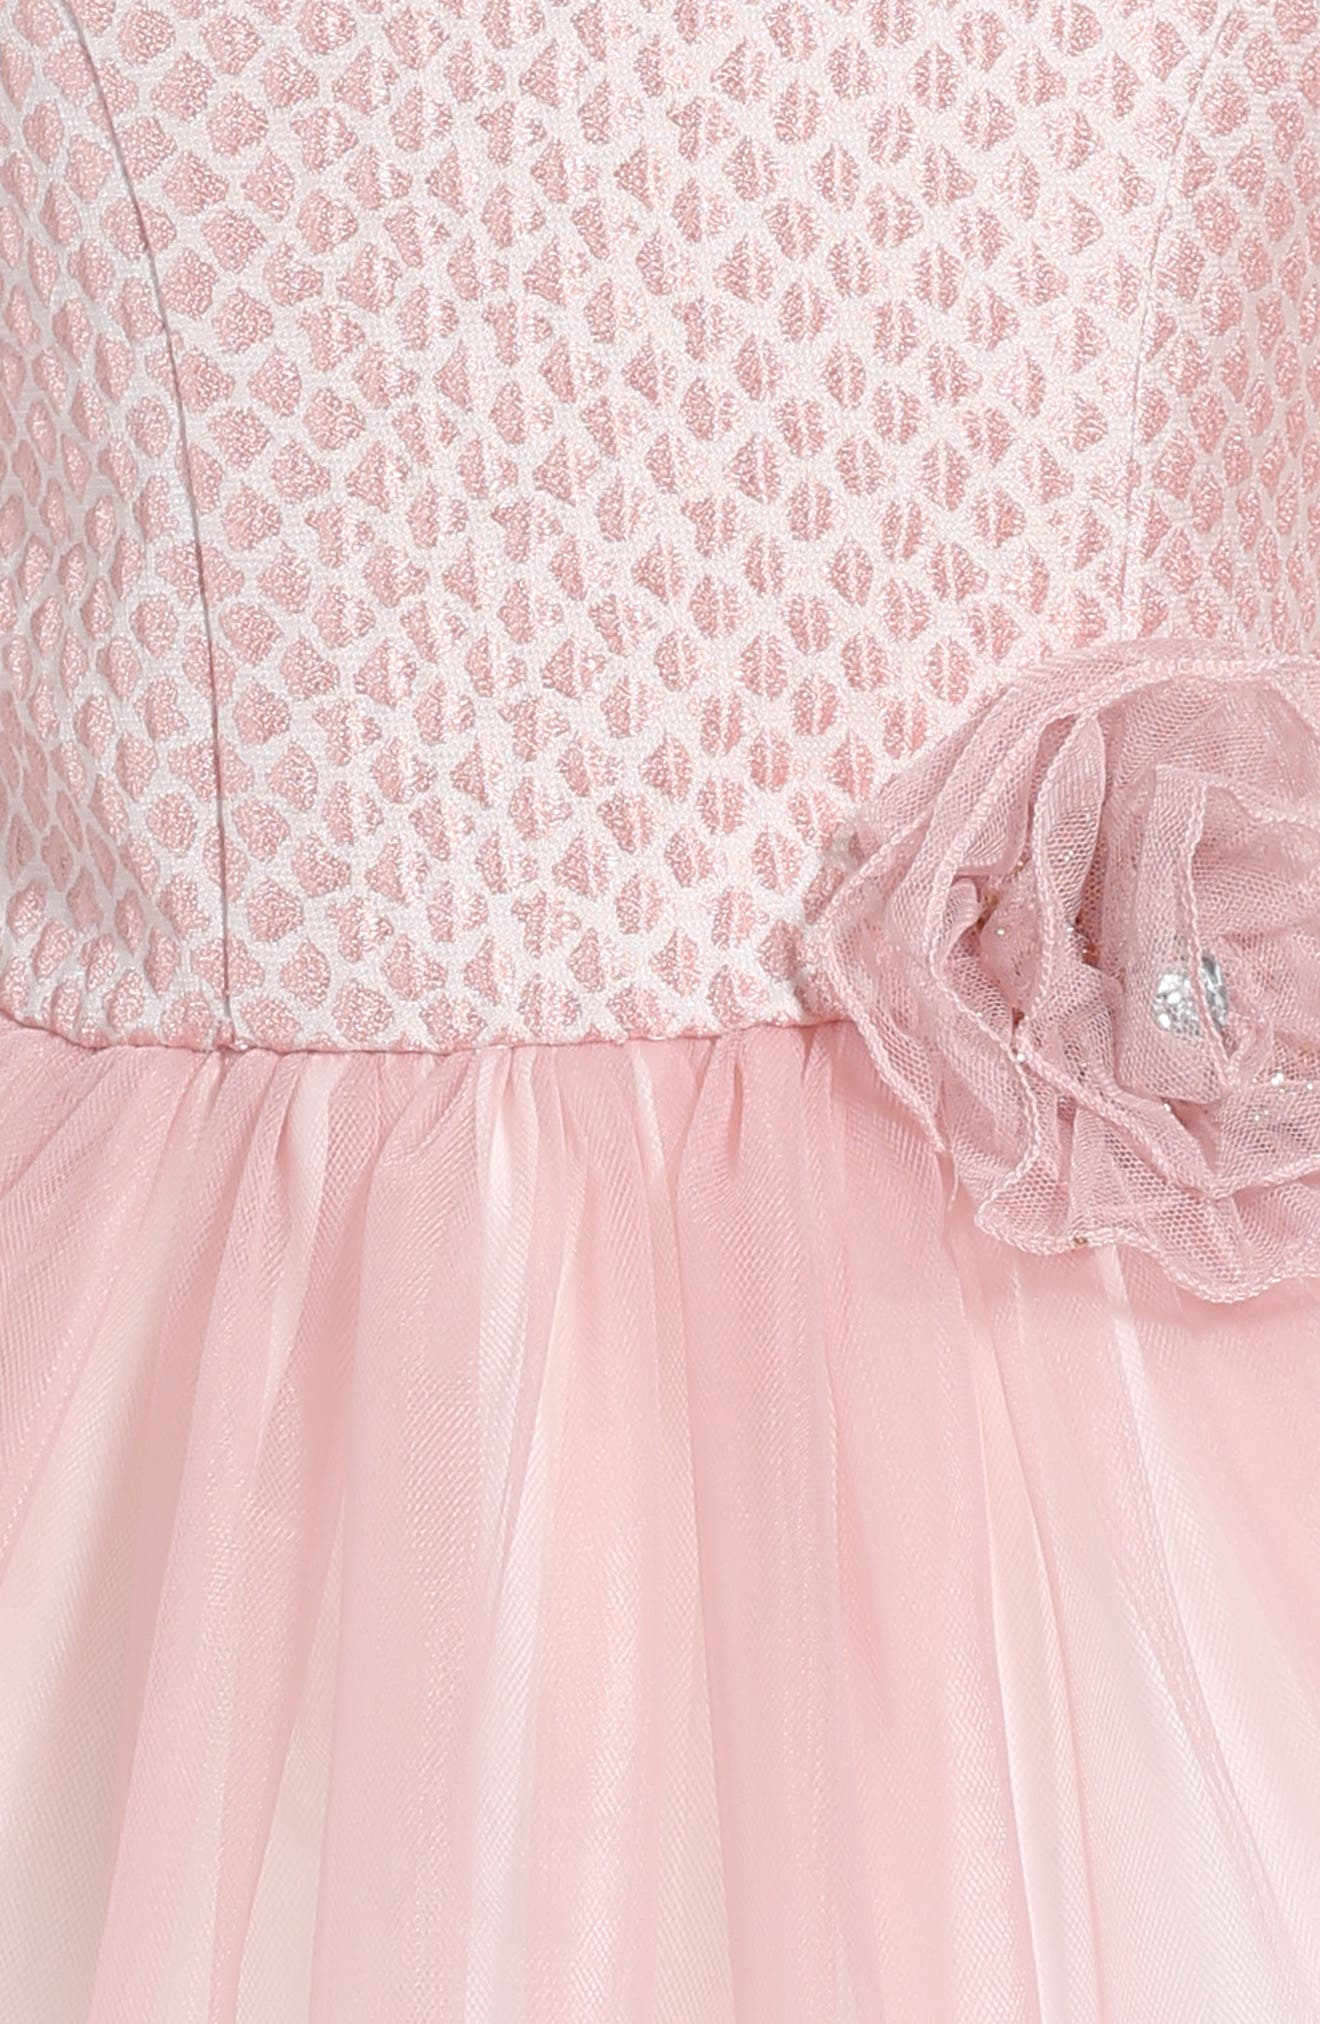 Brocade & Tulle Dress,                             Alternate thumbnail 3, color,                             650